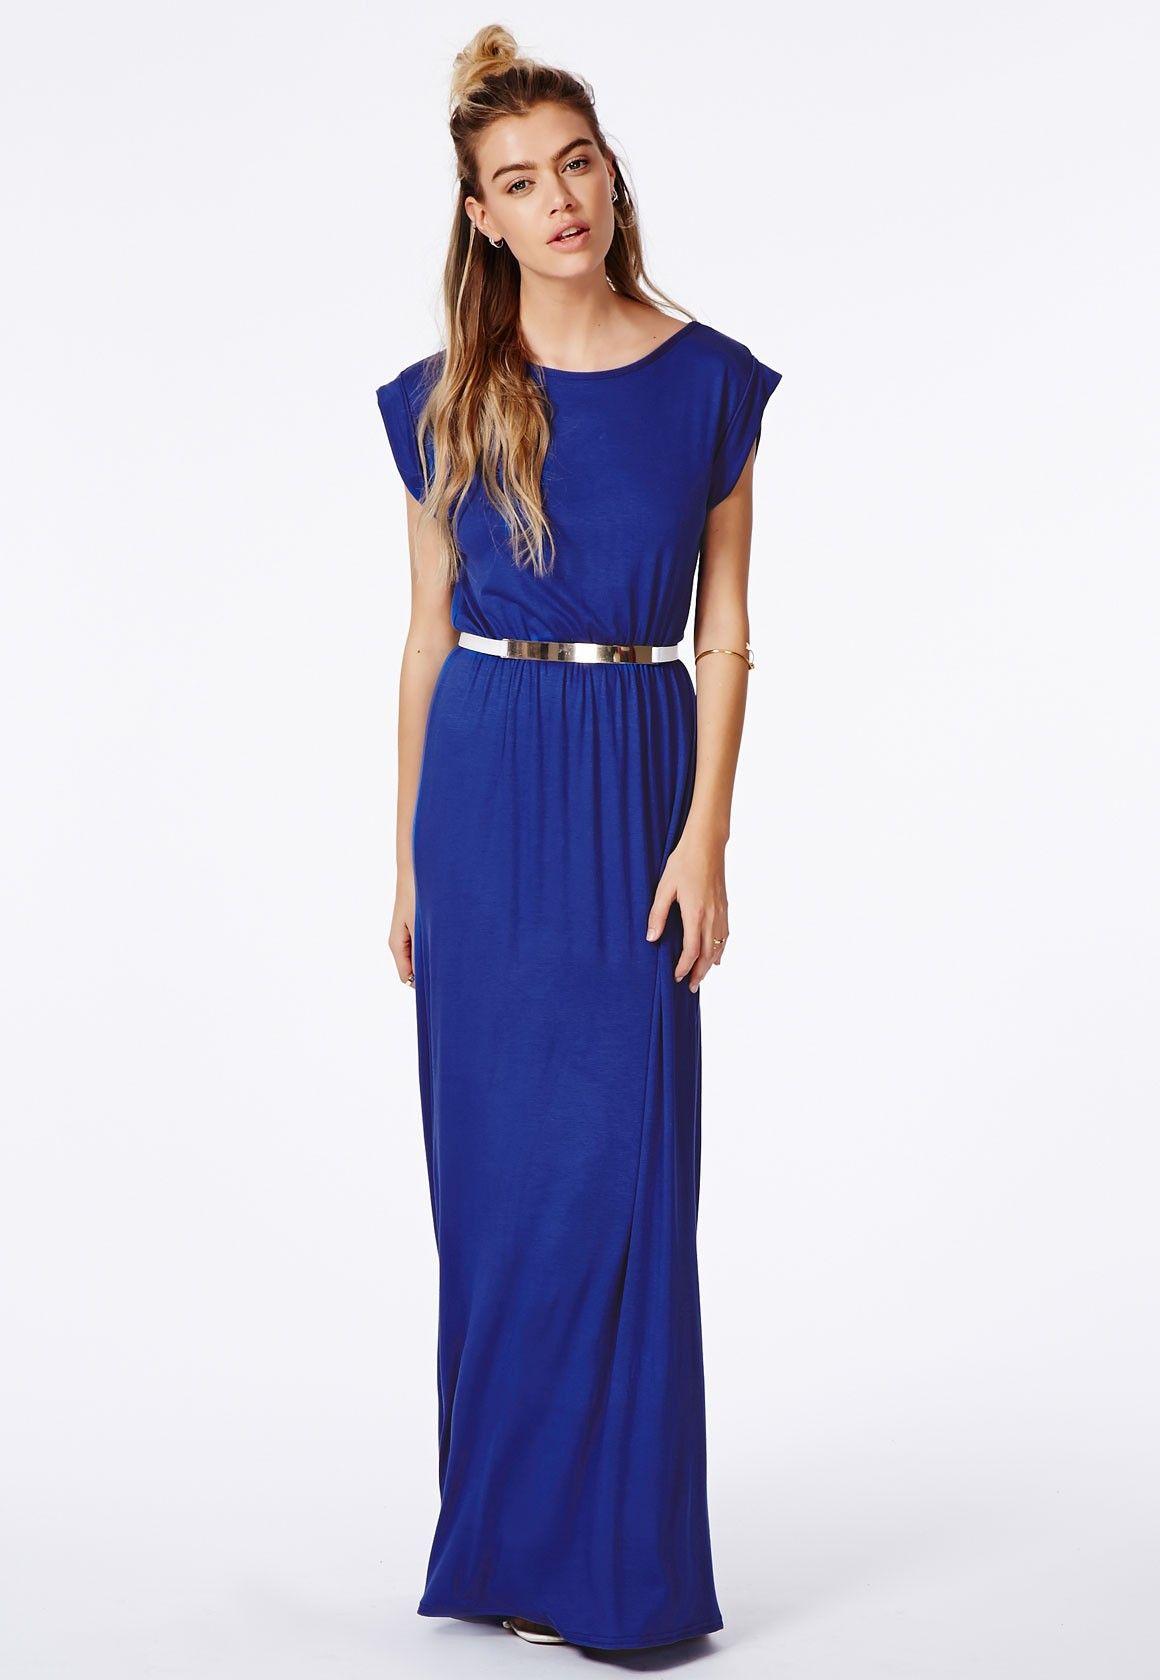 Petrol blue maxi dress